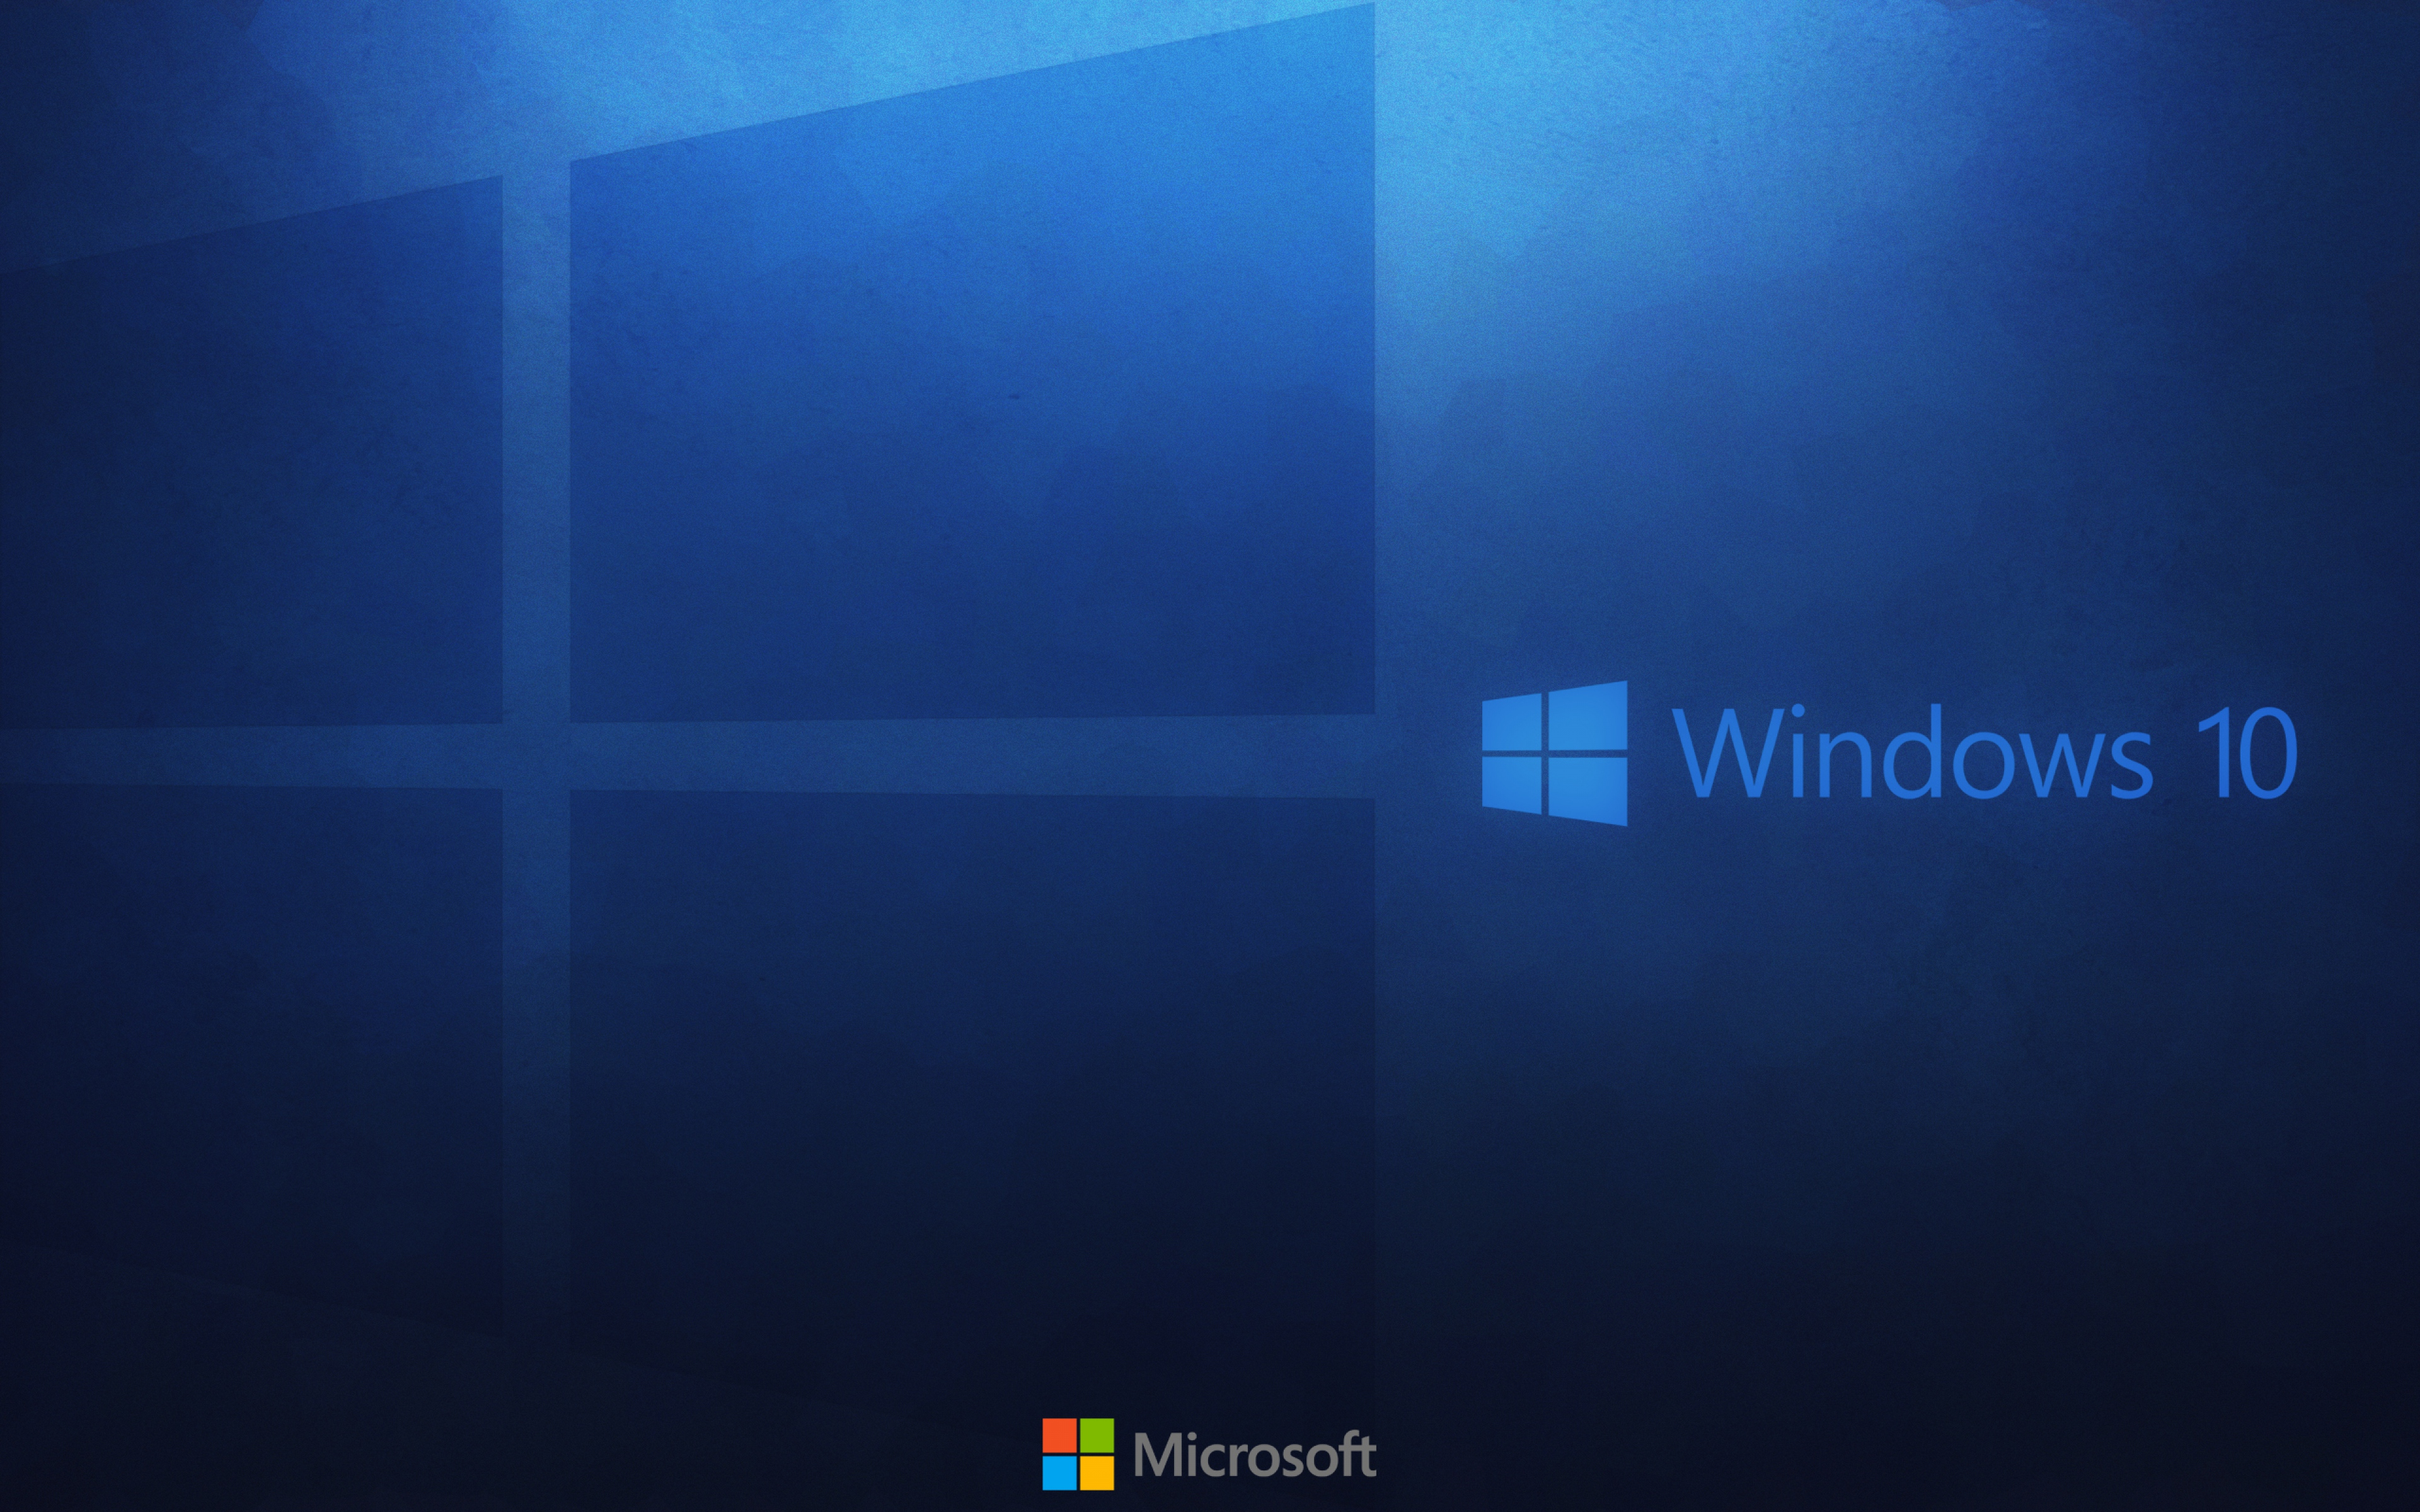 HD Background Windows 10 Wallpaper Microsoft Operating System Blue 3840x2400